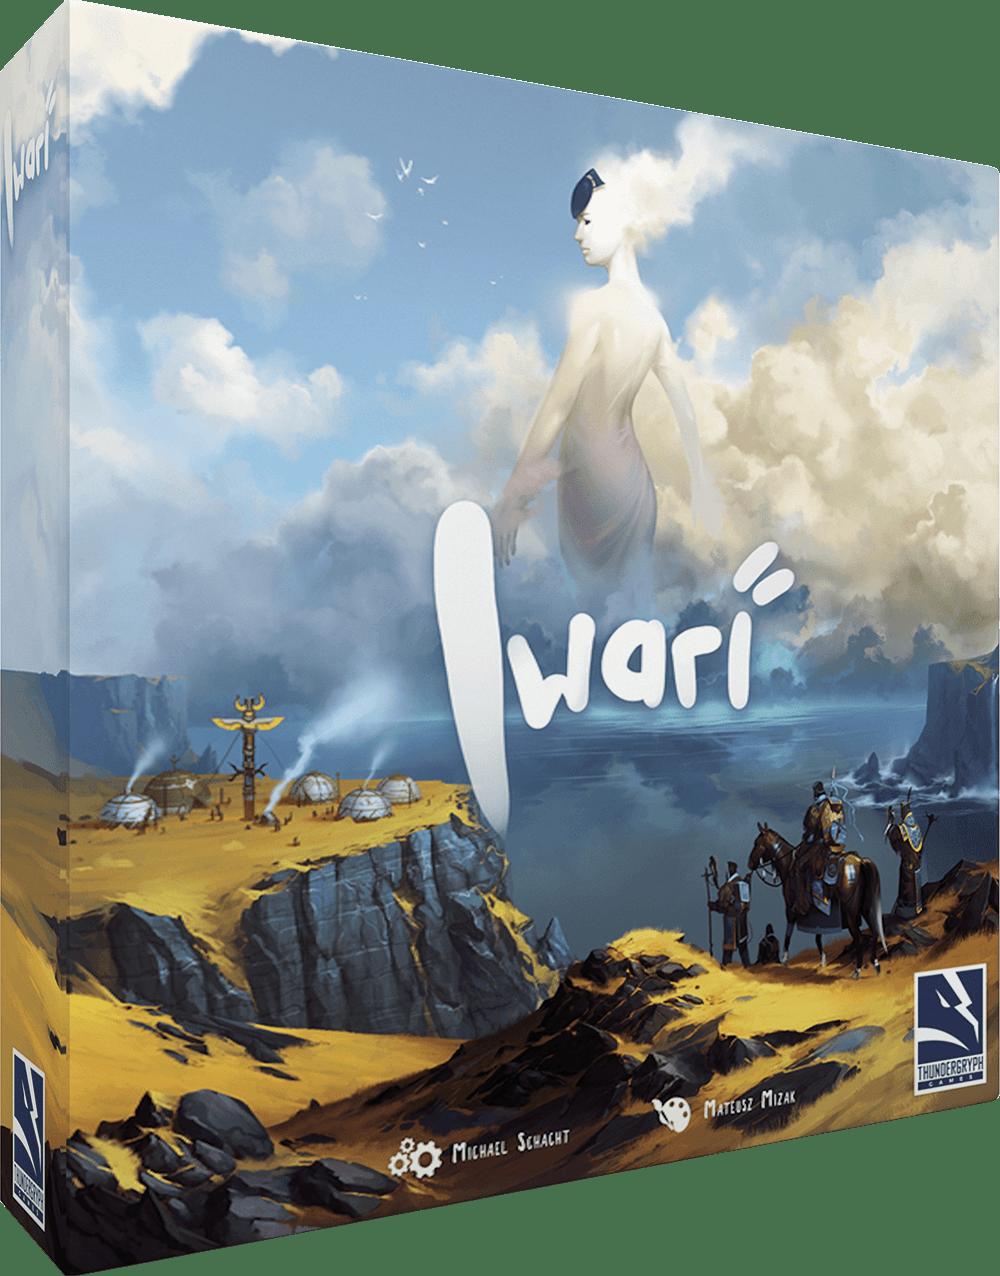 Thundergryph Games and Iwari